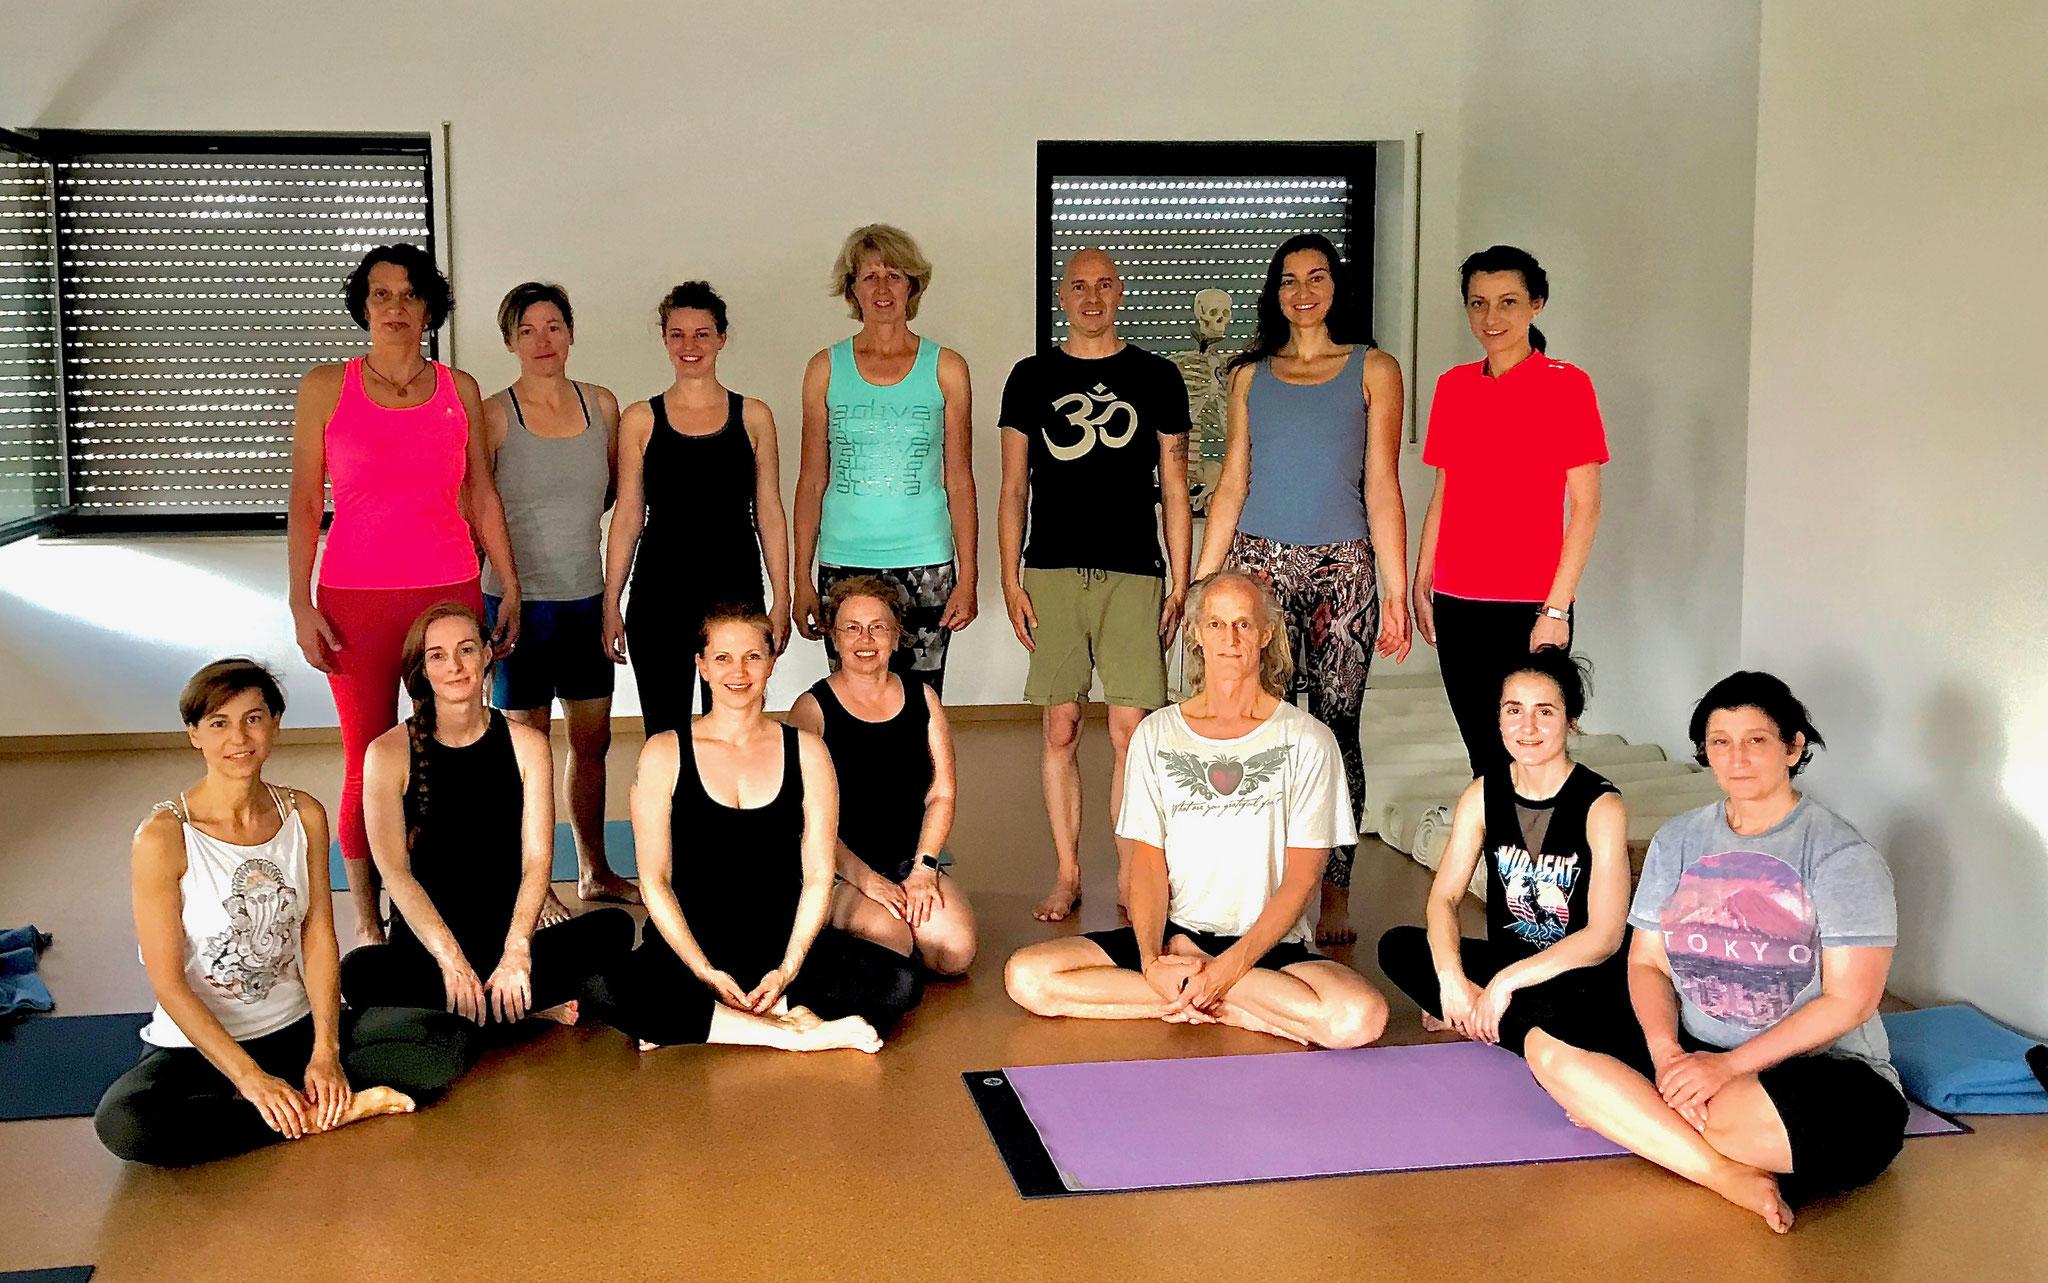 Ashtanga Yoga Workshop mit Chuck Miller bei Yamida - Yogaschule  Yoga Lüdinghausen, Datteln, Selm, Nordkirchen, Ascheberg, Cappenberg, Olfen, Senden